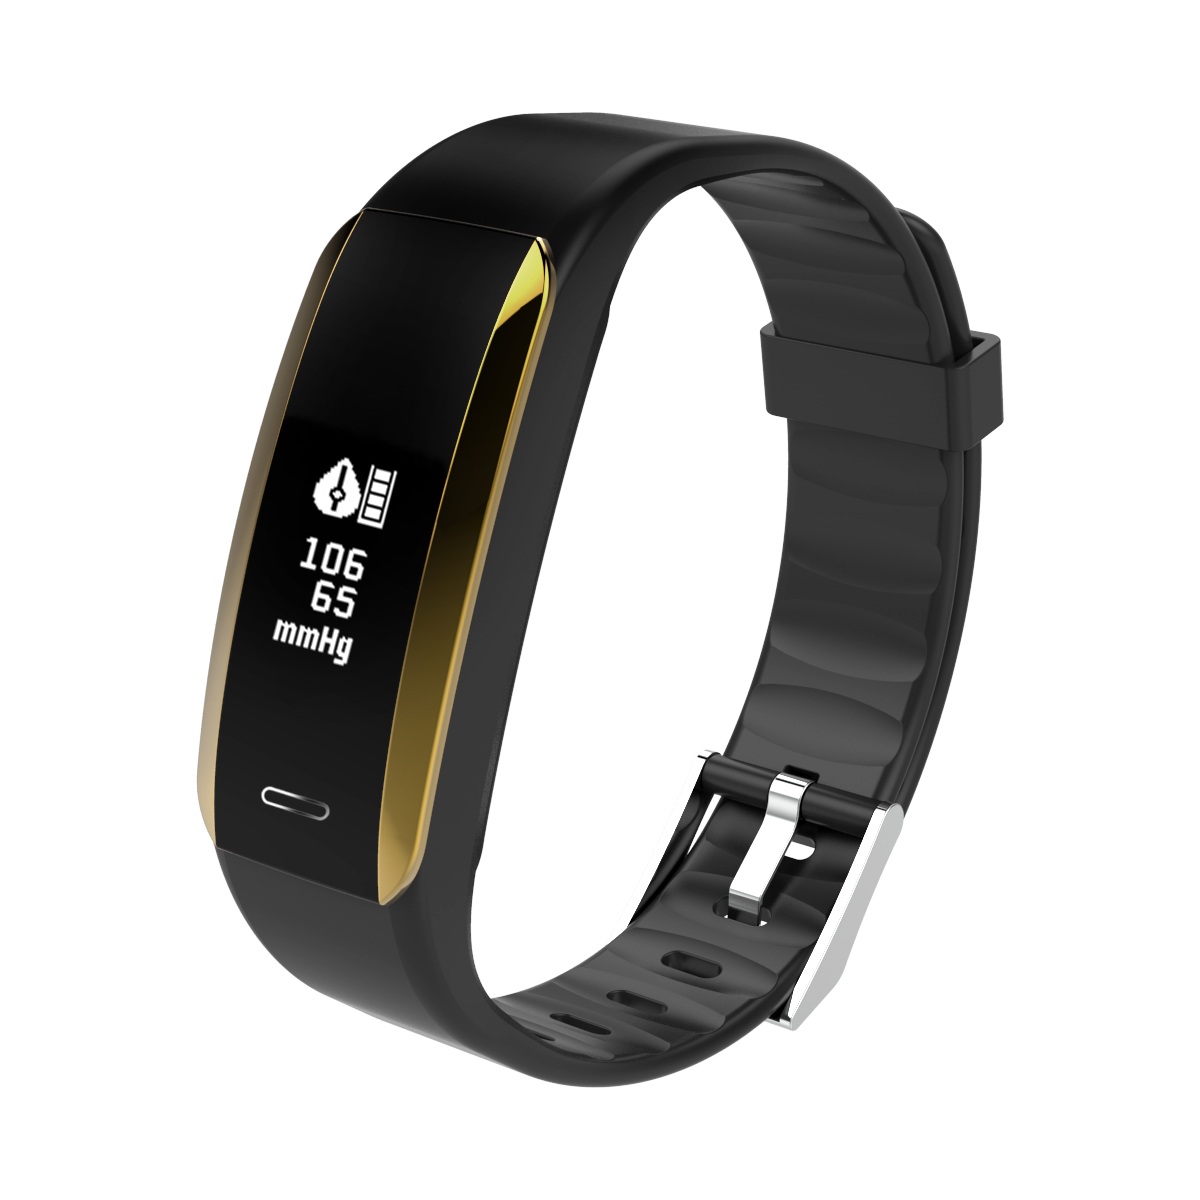 IP67 Waterproof Fitness Tracker Pedometer Blood Oxygen Heart Rate Monitor Running Sport Step Tracker Walking Distance Counter